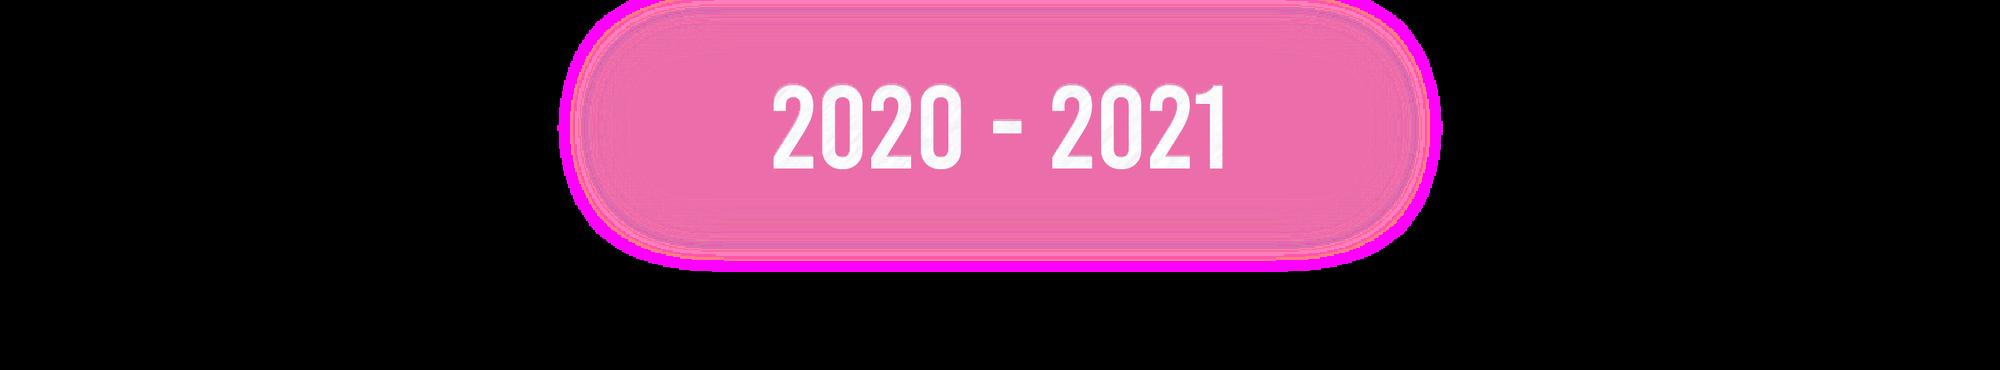 Illustratie_2020_-_2021.png